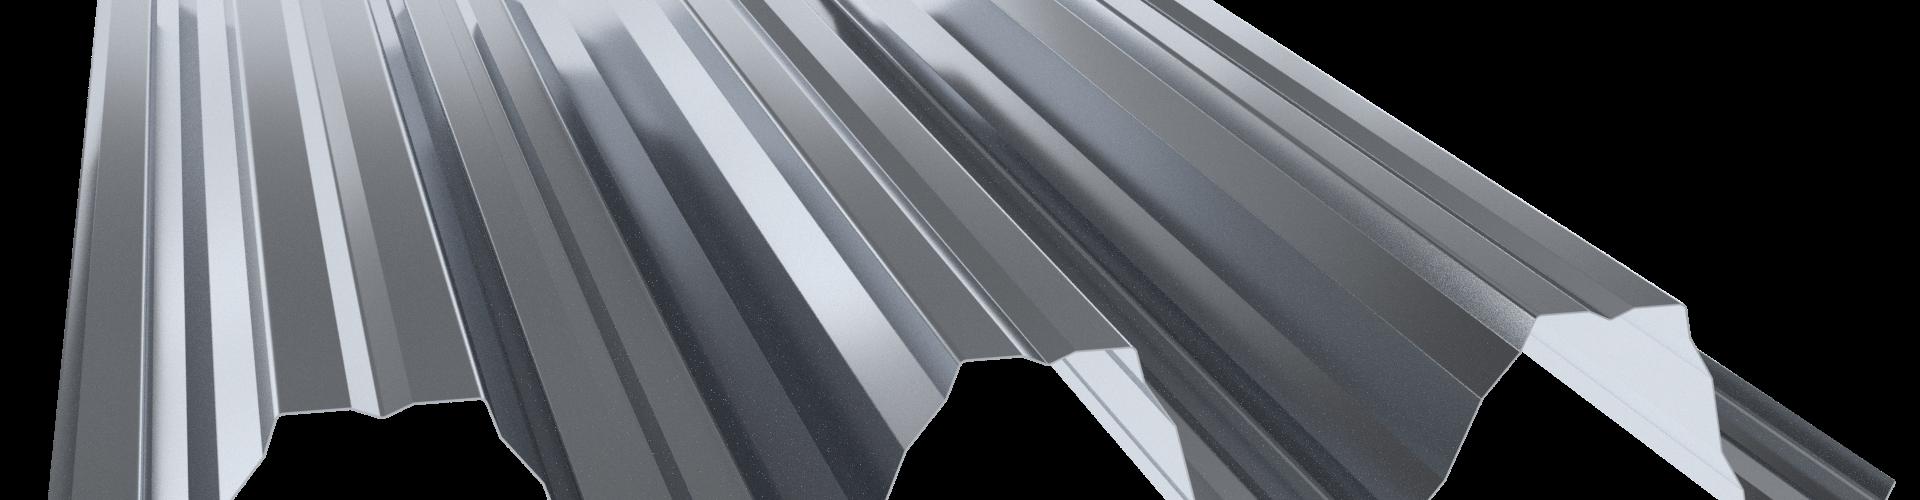 Konstruktionsprofil T135PKonstruktionsprofil T135P